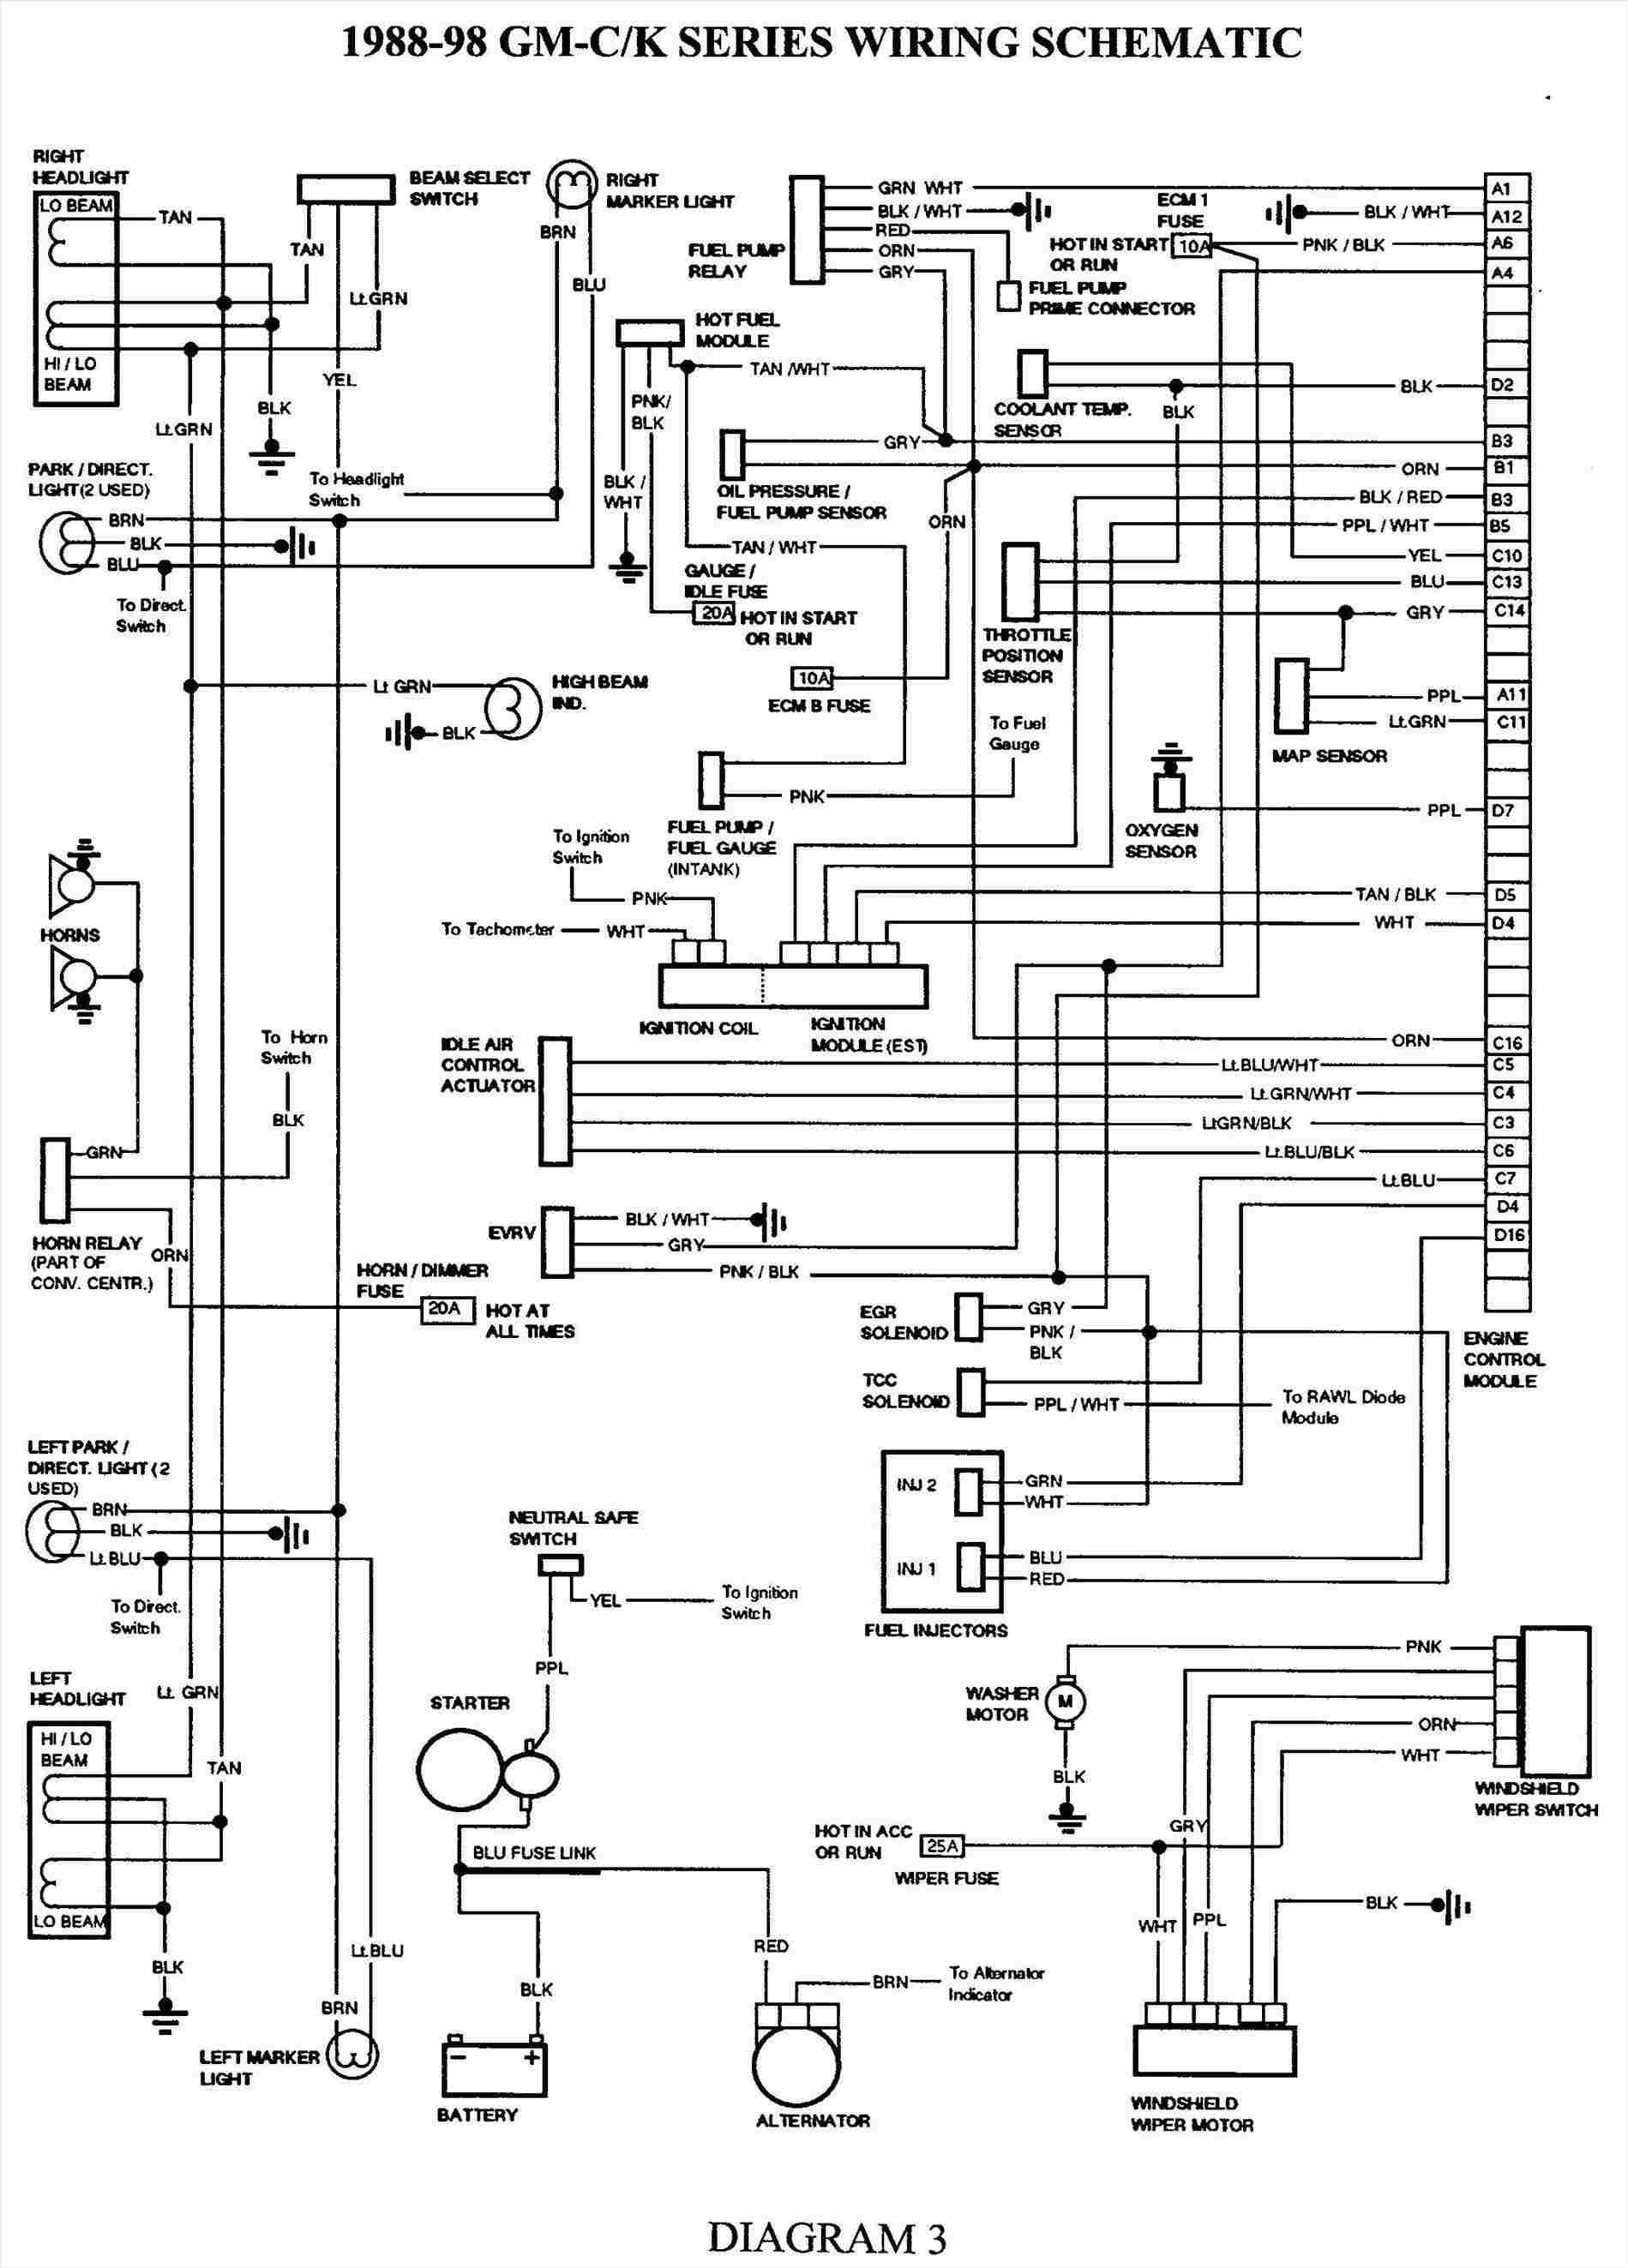 Coachmen Wiring Diagram | Wiring Diagram - Travel Trailer Battery Wiring Diagram